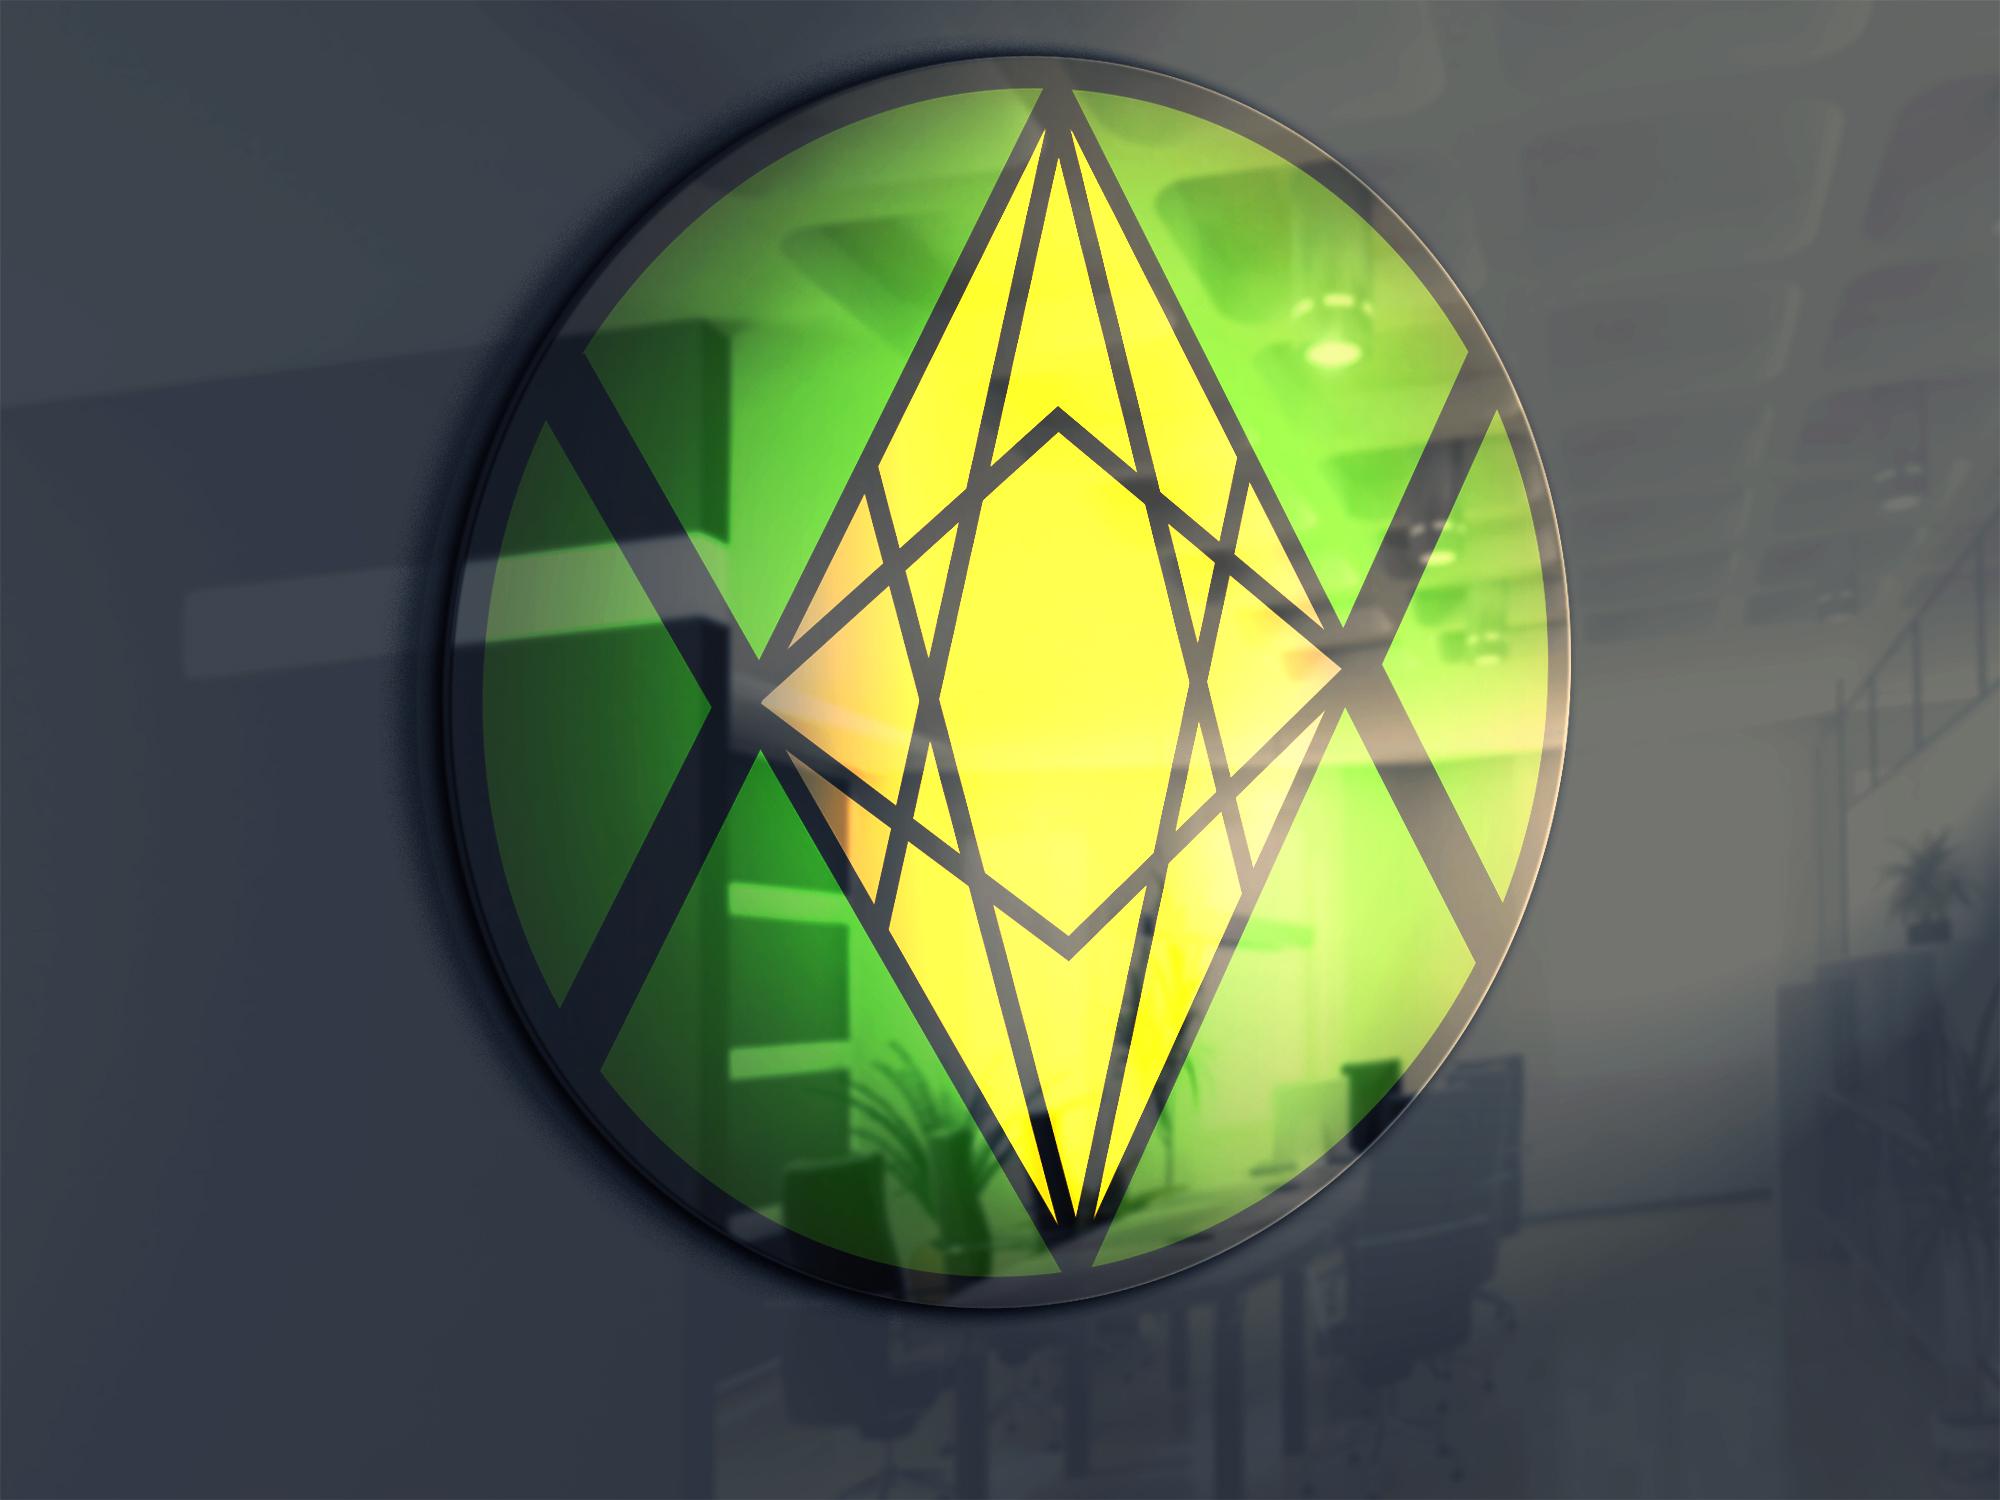 Нужен логотип (эмблема) для самодельного квадроцикла фото f_1595afe7e12b7949.jpg